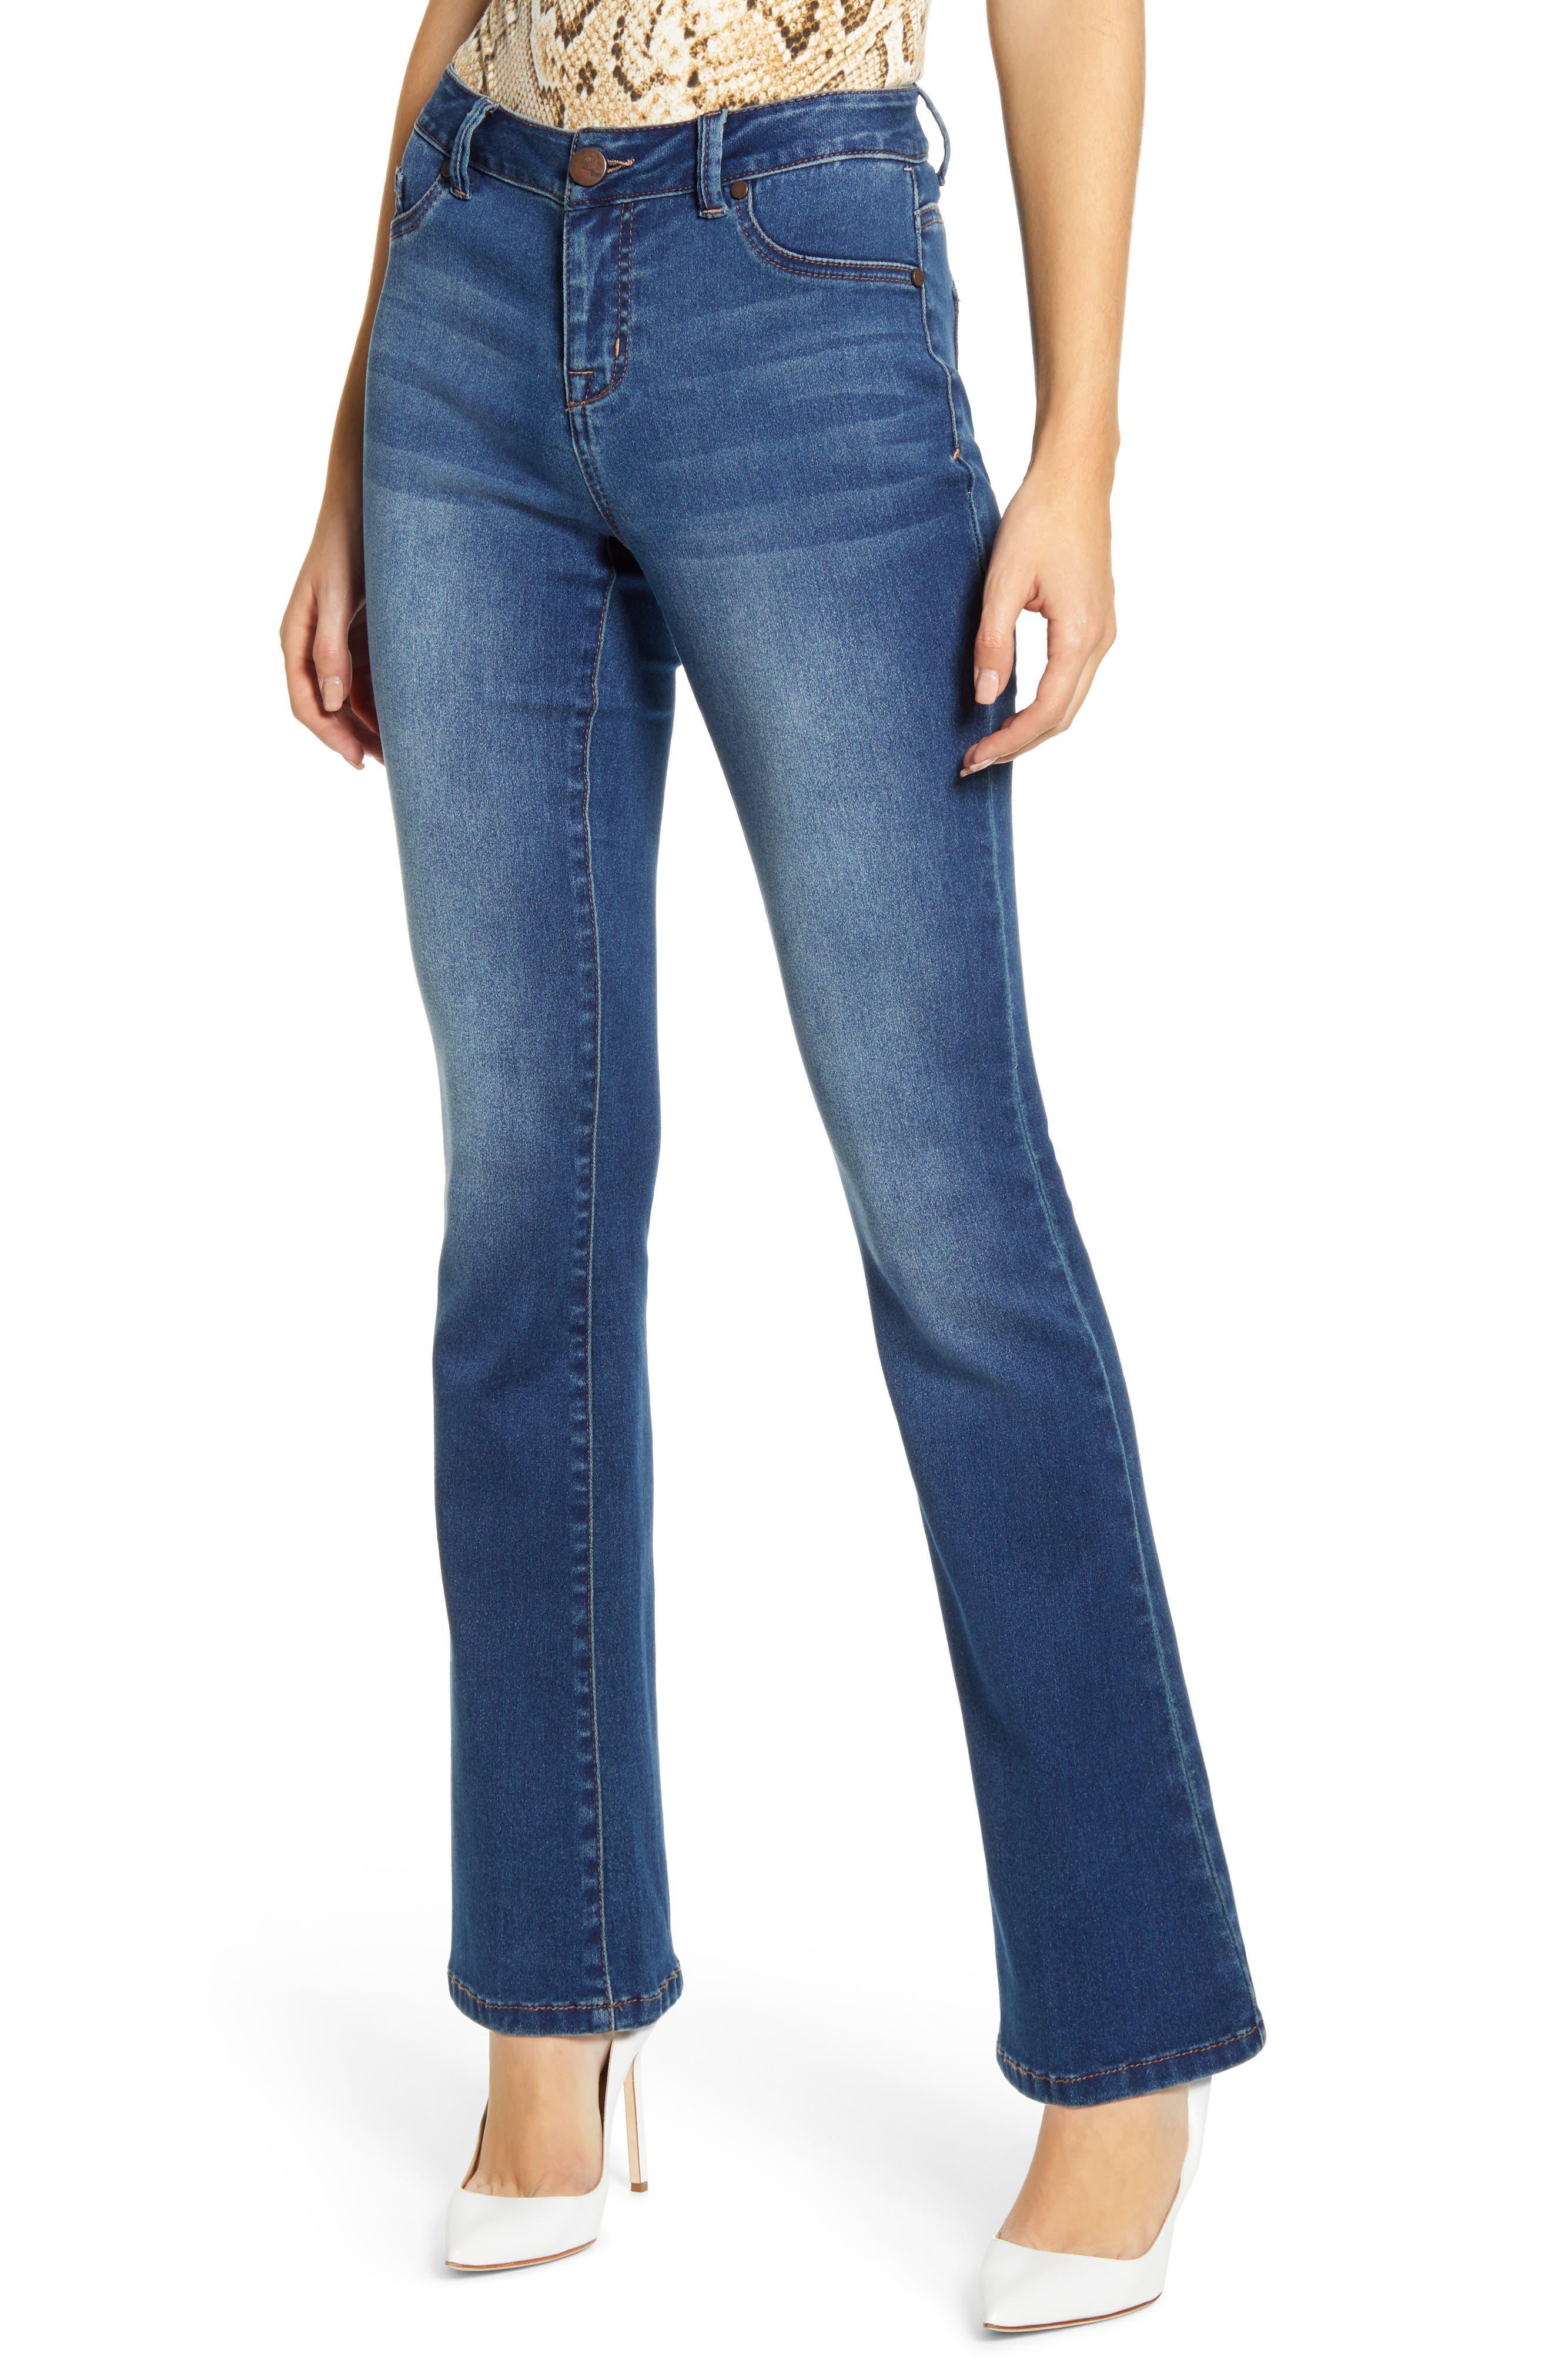 Women's 1822 Denim Butter Slim Fit Bootcut Jeans